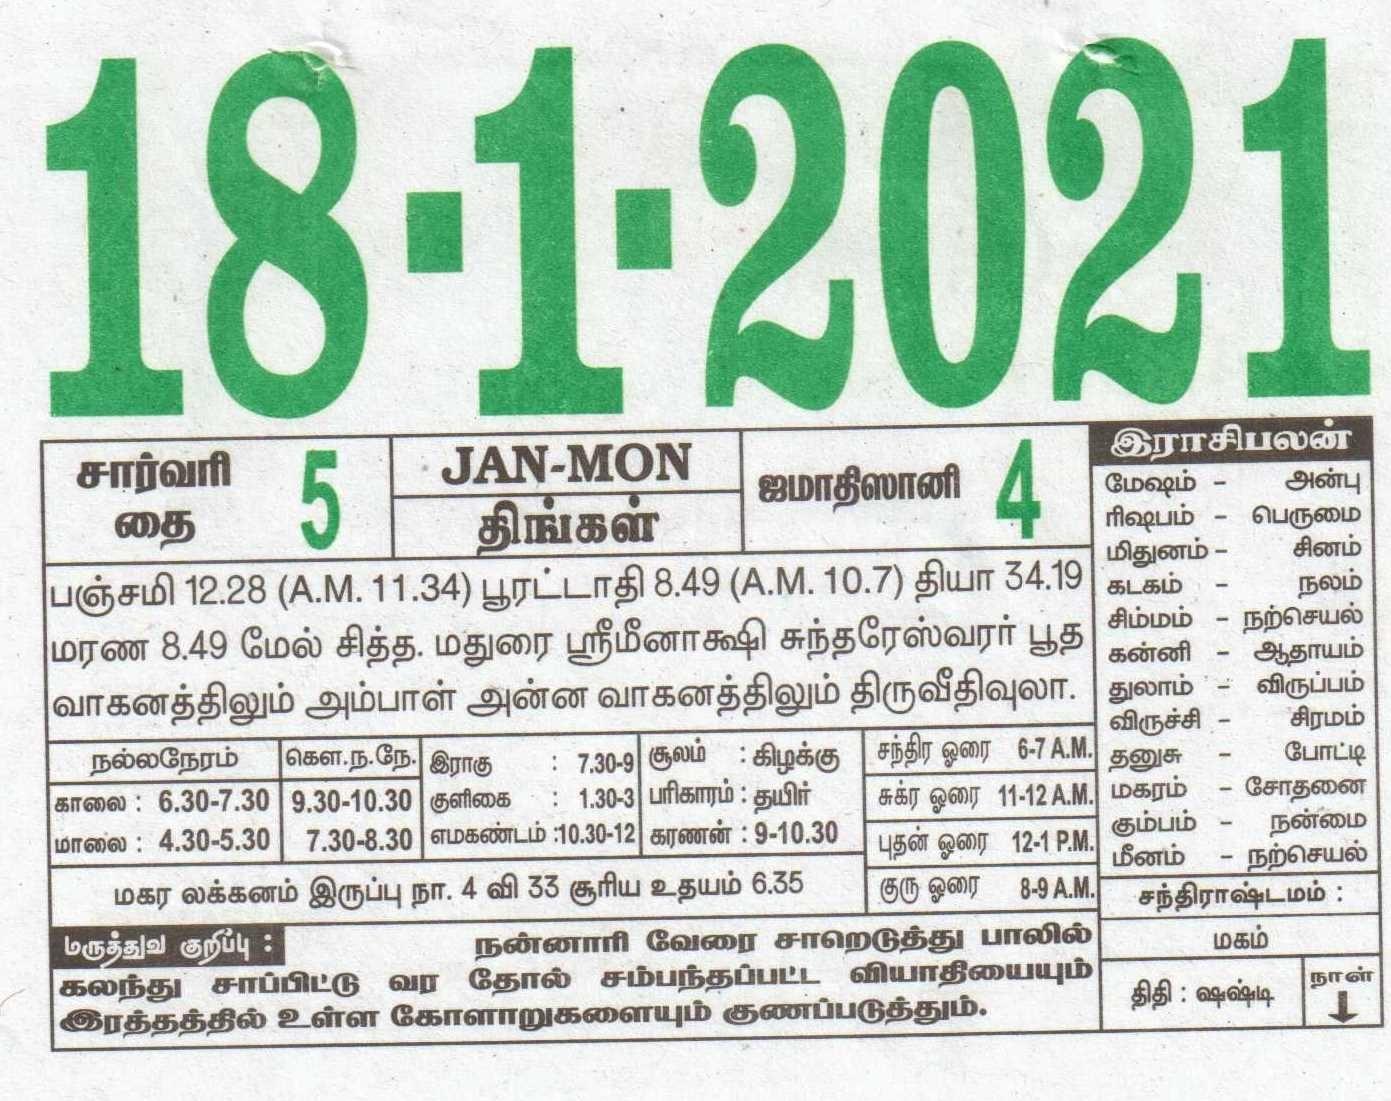 18-01-2021 Daily Calendar | Date 18 , January Daily Tear Off Calendar | Daily Panchangam Rasi Palan Marriage Dates In June 2021 Hindu Calendar